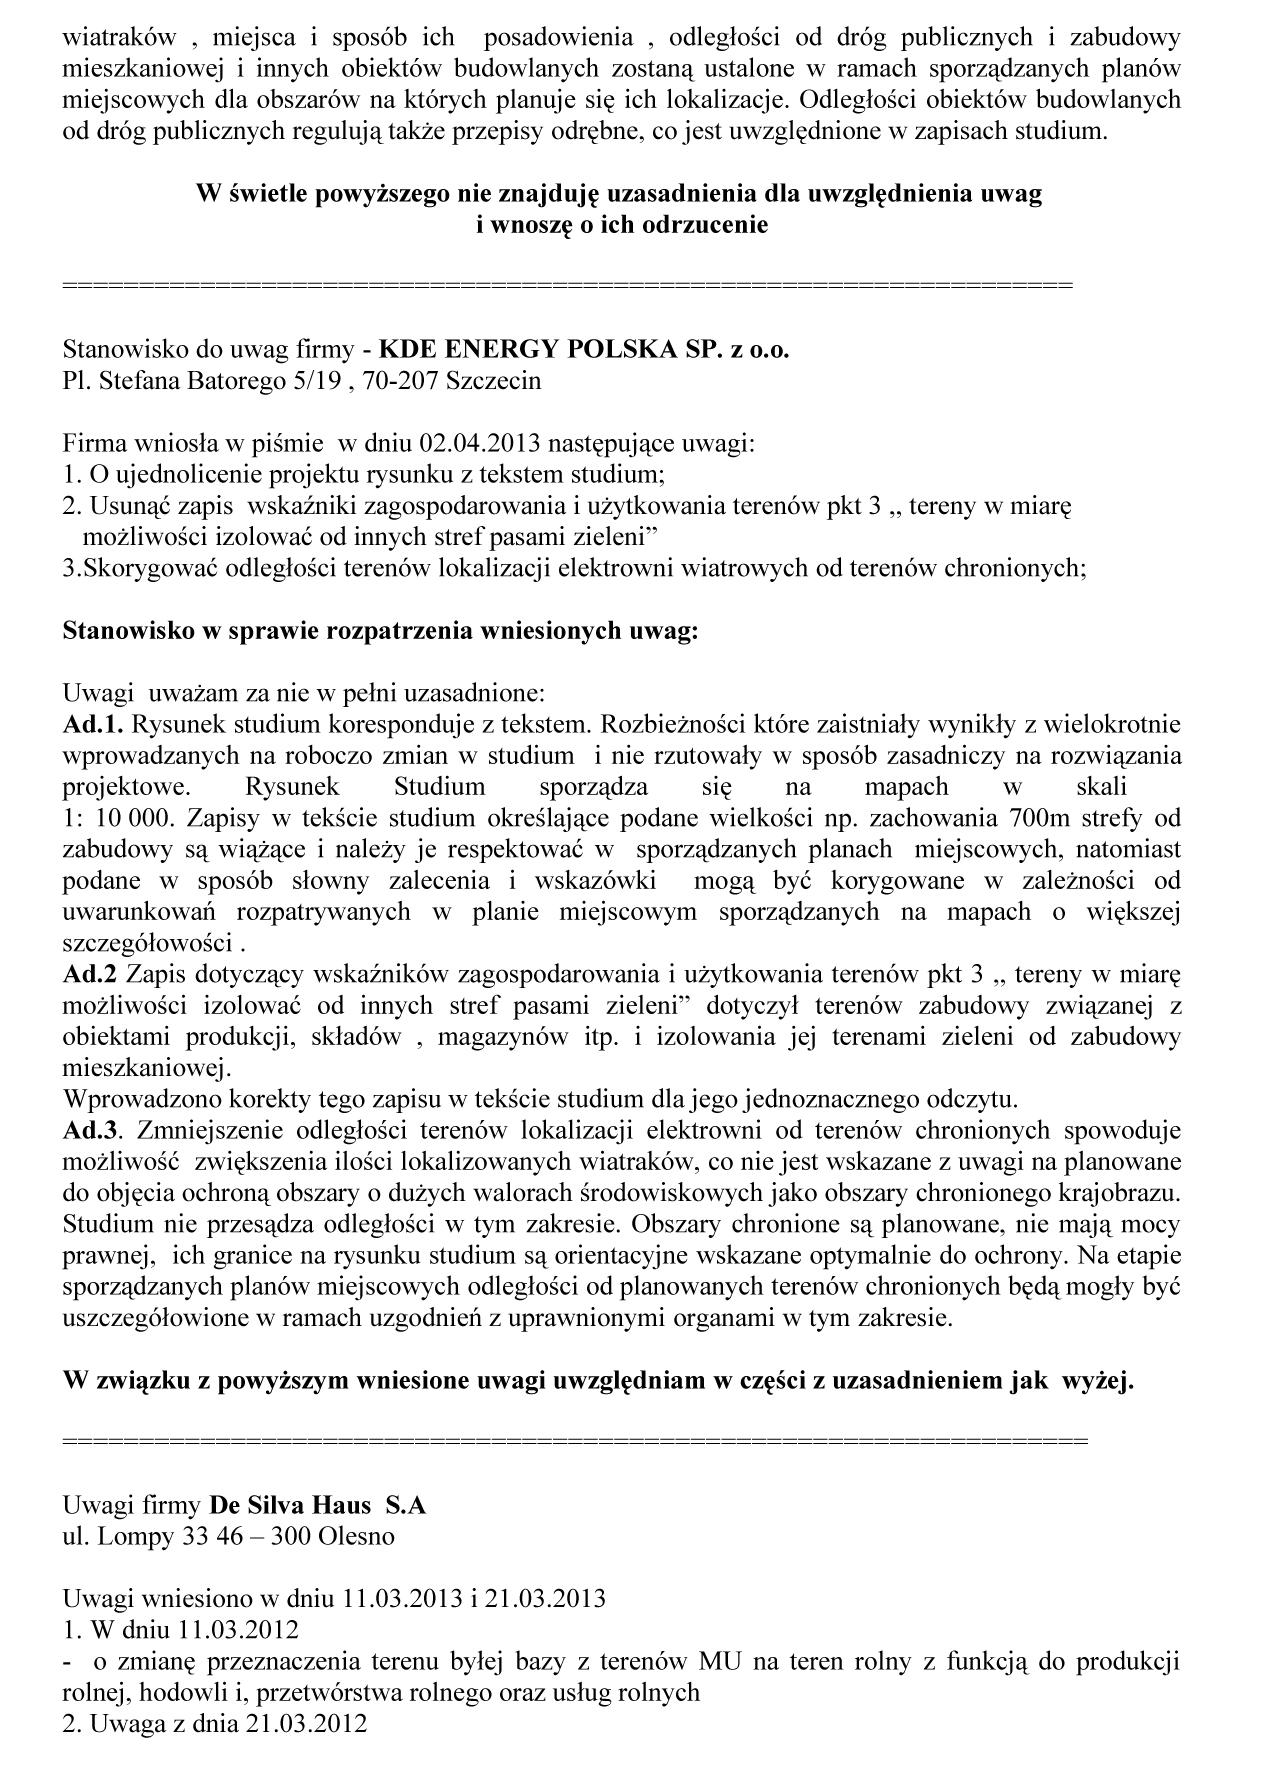 Zalacznik37 copy.jpeg